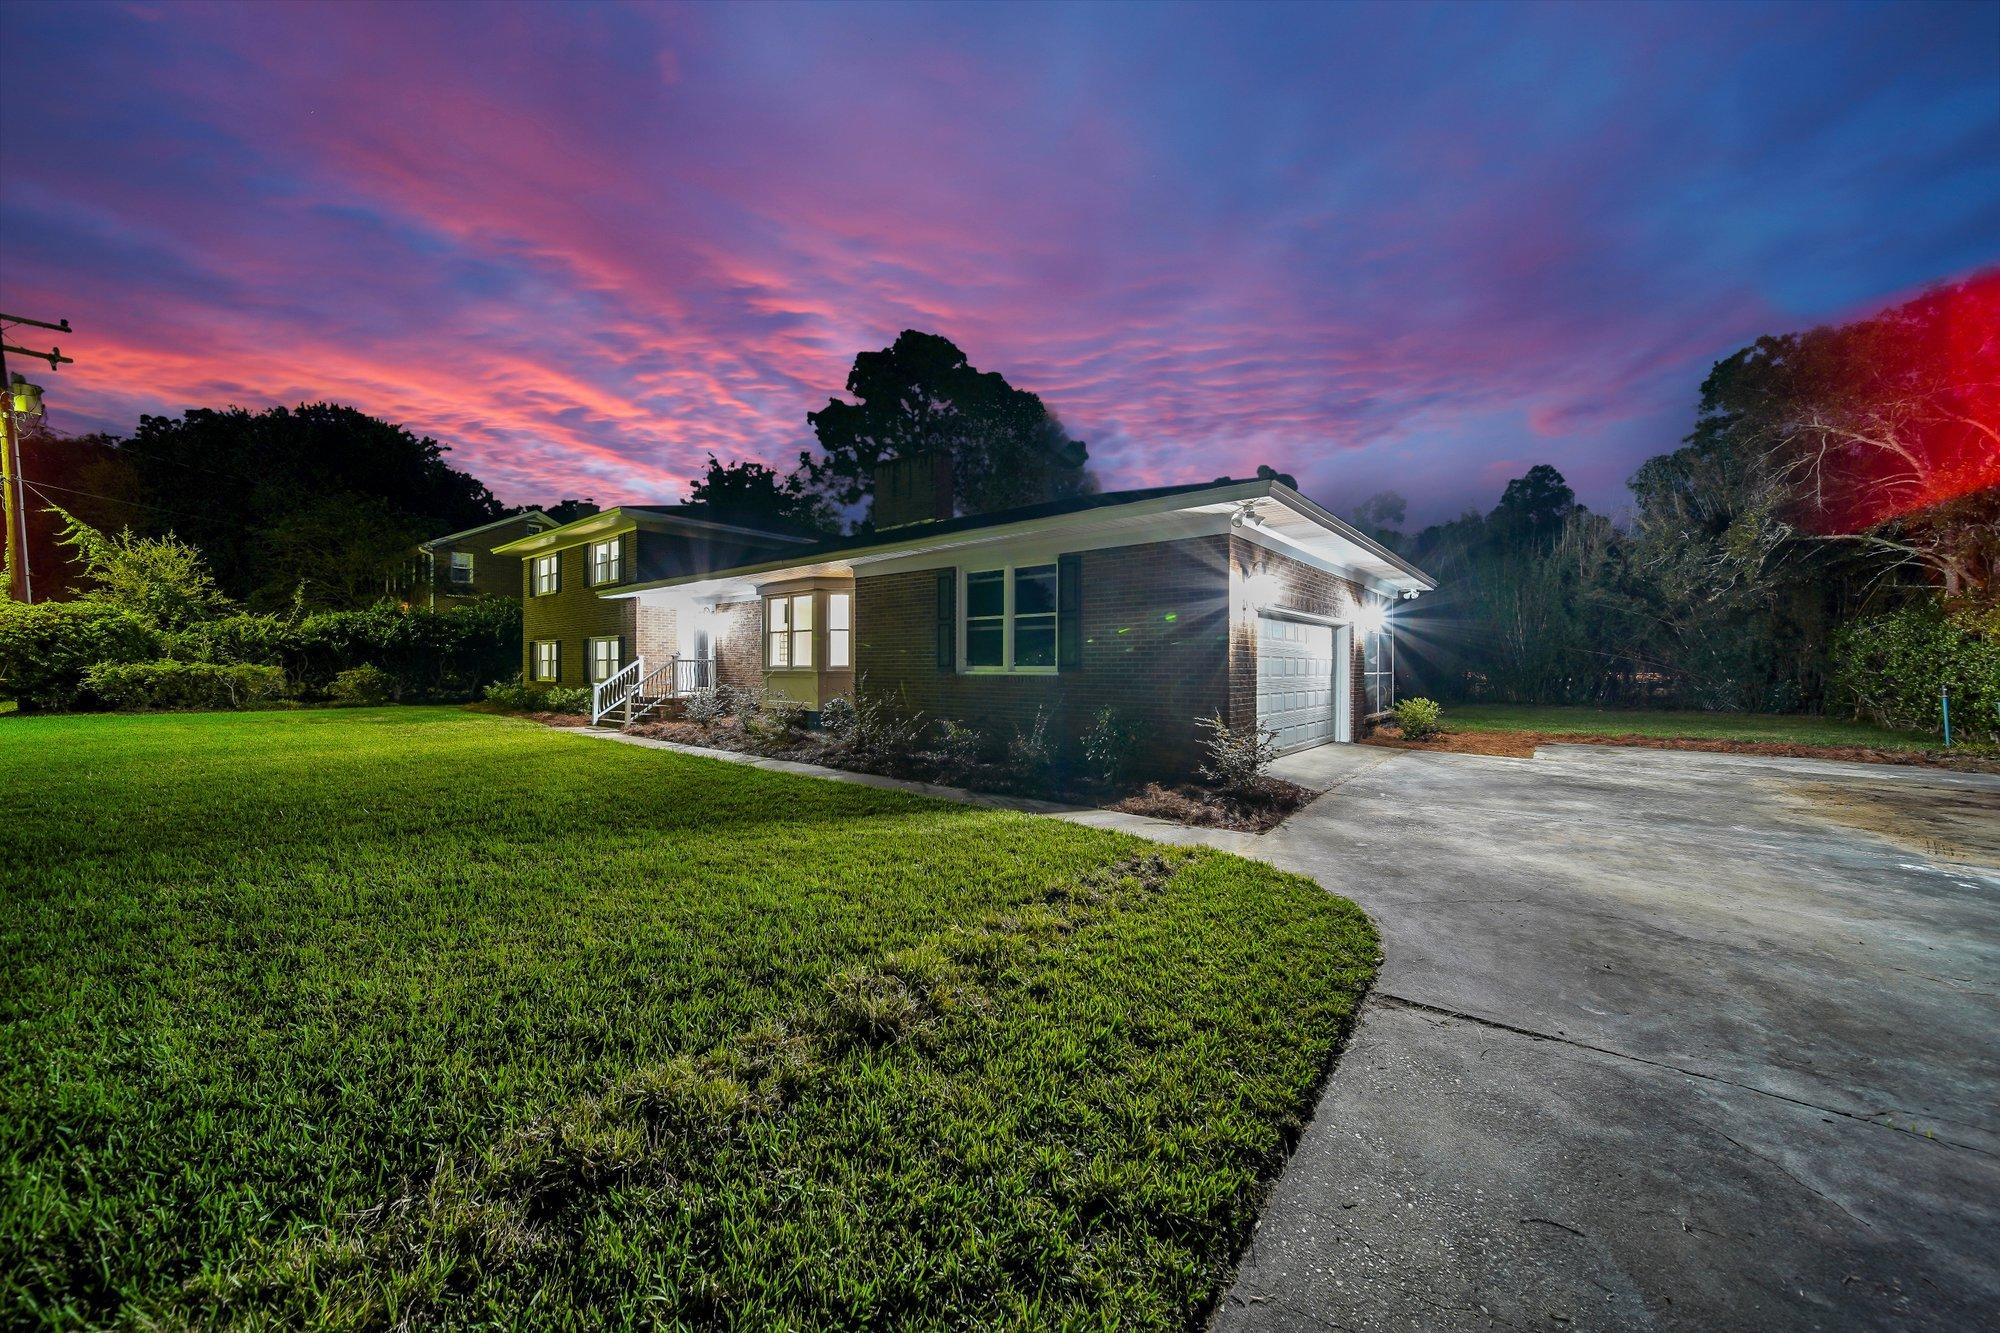 Country Club II Homes For Sale - 1477 Burningtree, Charleston, SC - 1